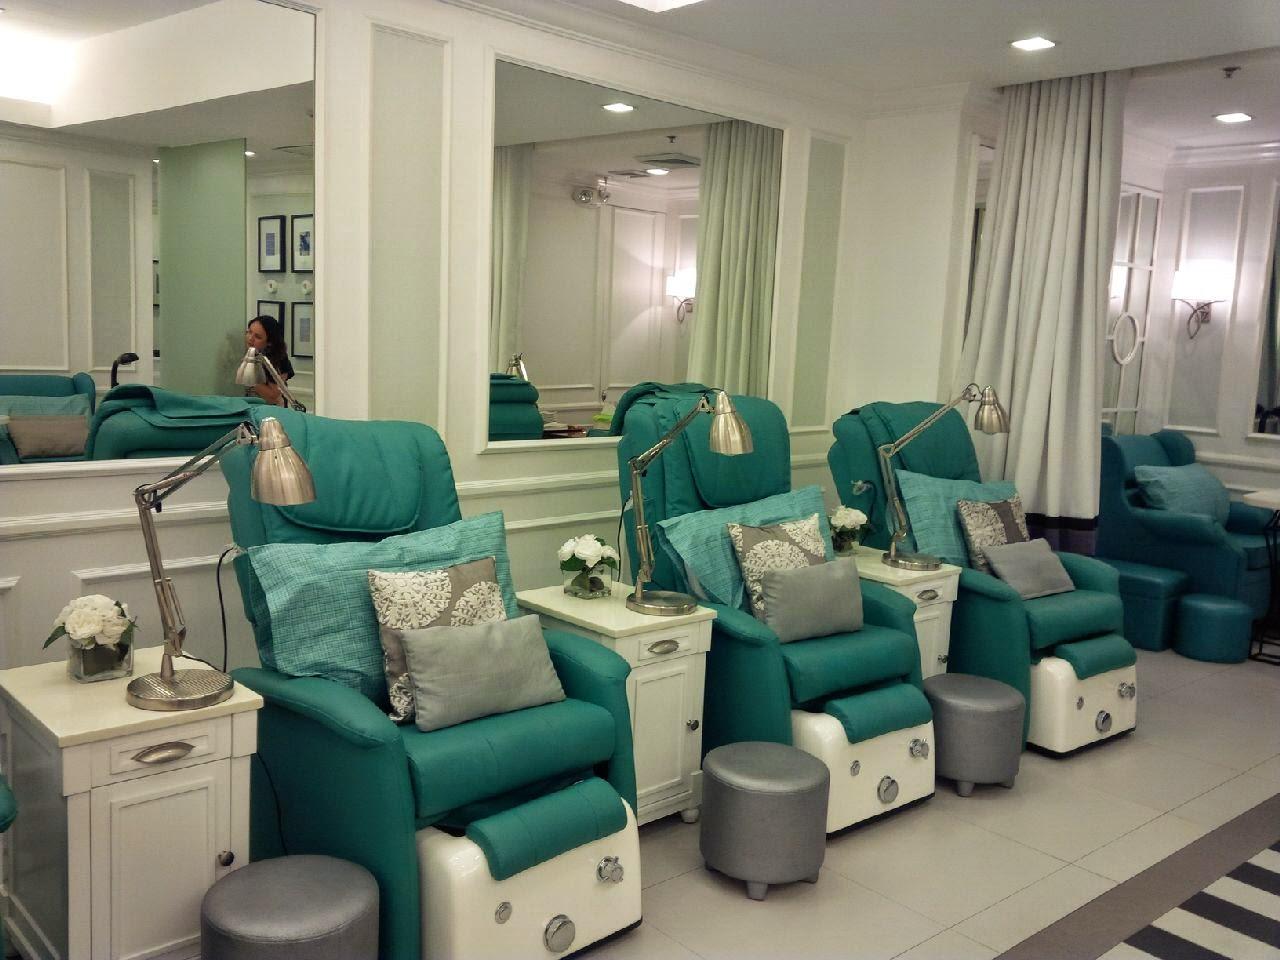 Chasing Bernadette The Secret Of Tips N Toes Nail Salon